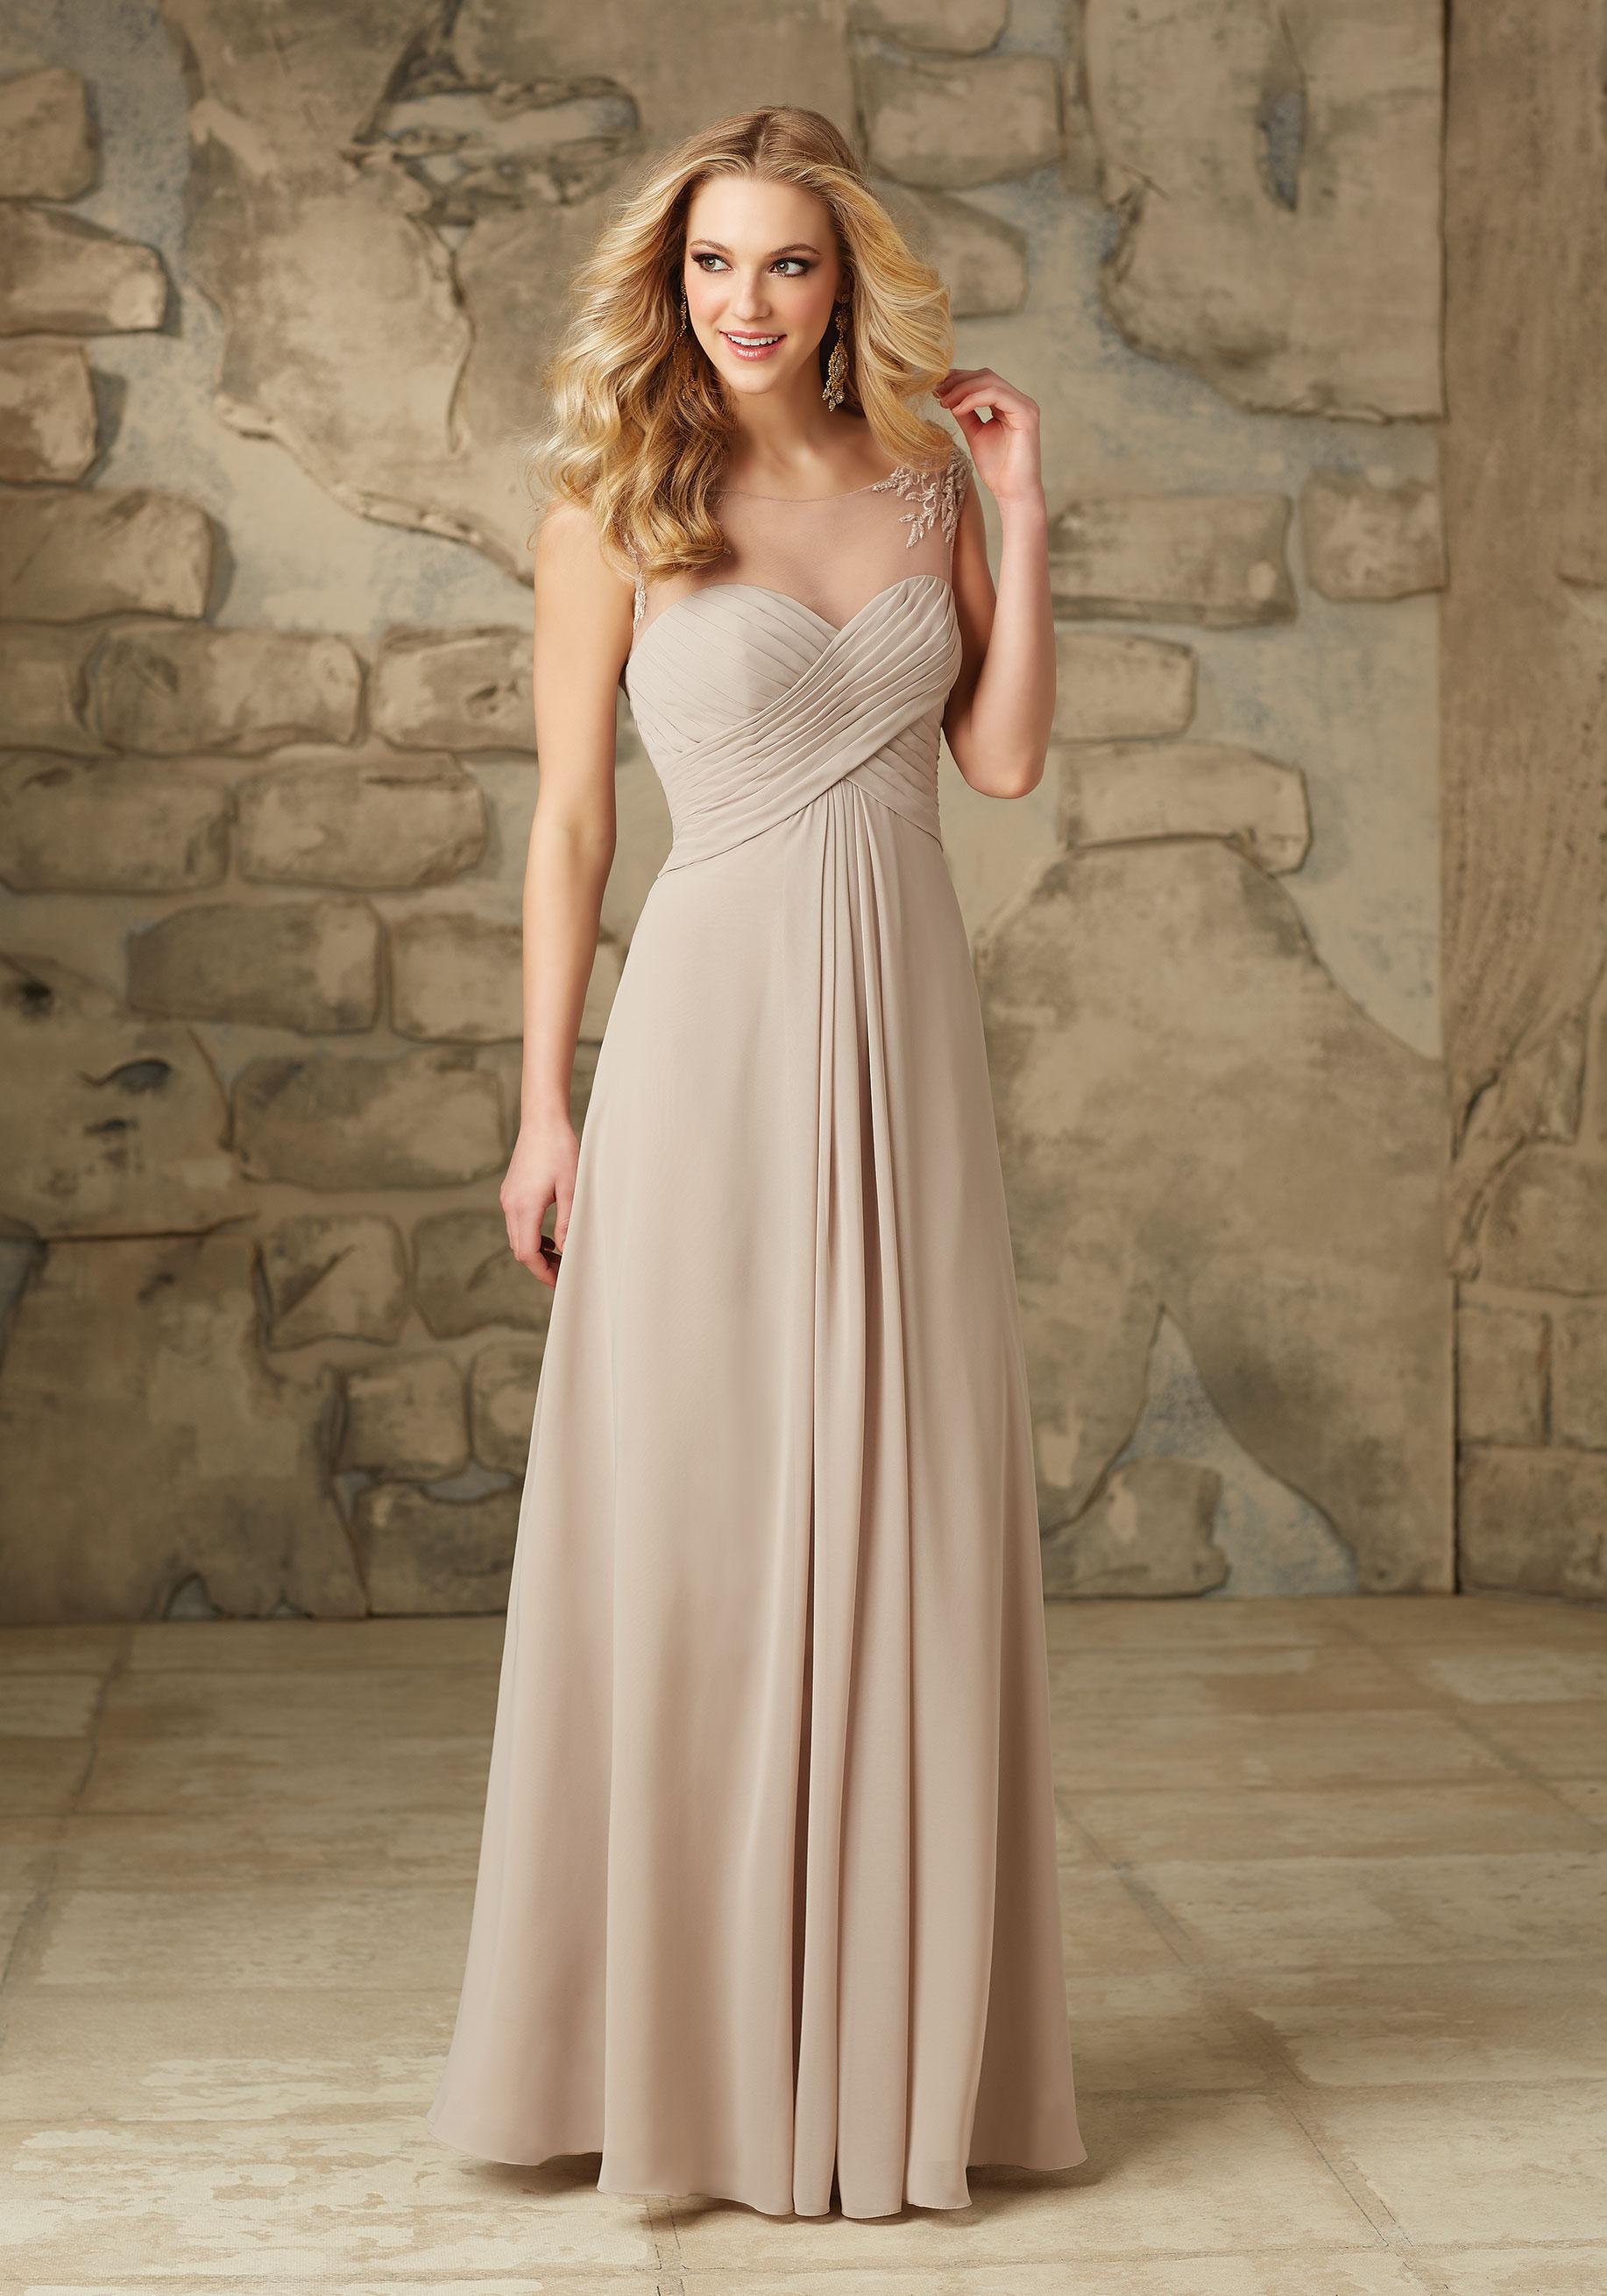 0f9f831a984a3 Mori lee 106 bridesmaid dress - Catrinas Bridal